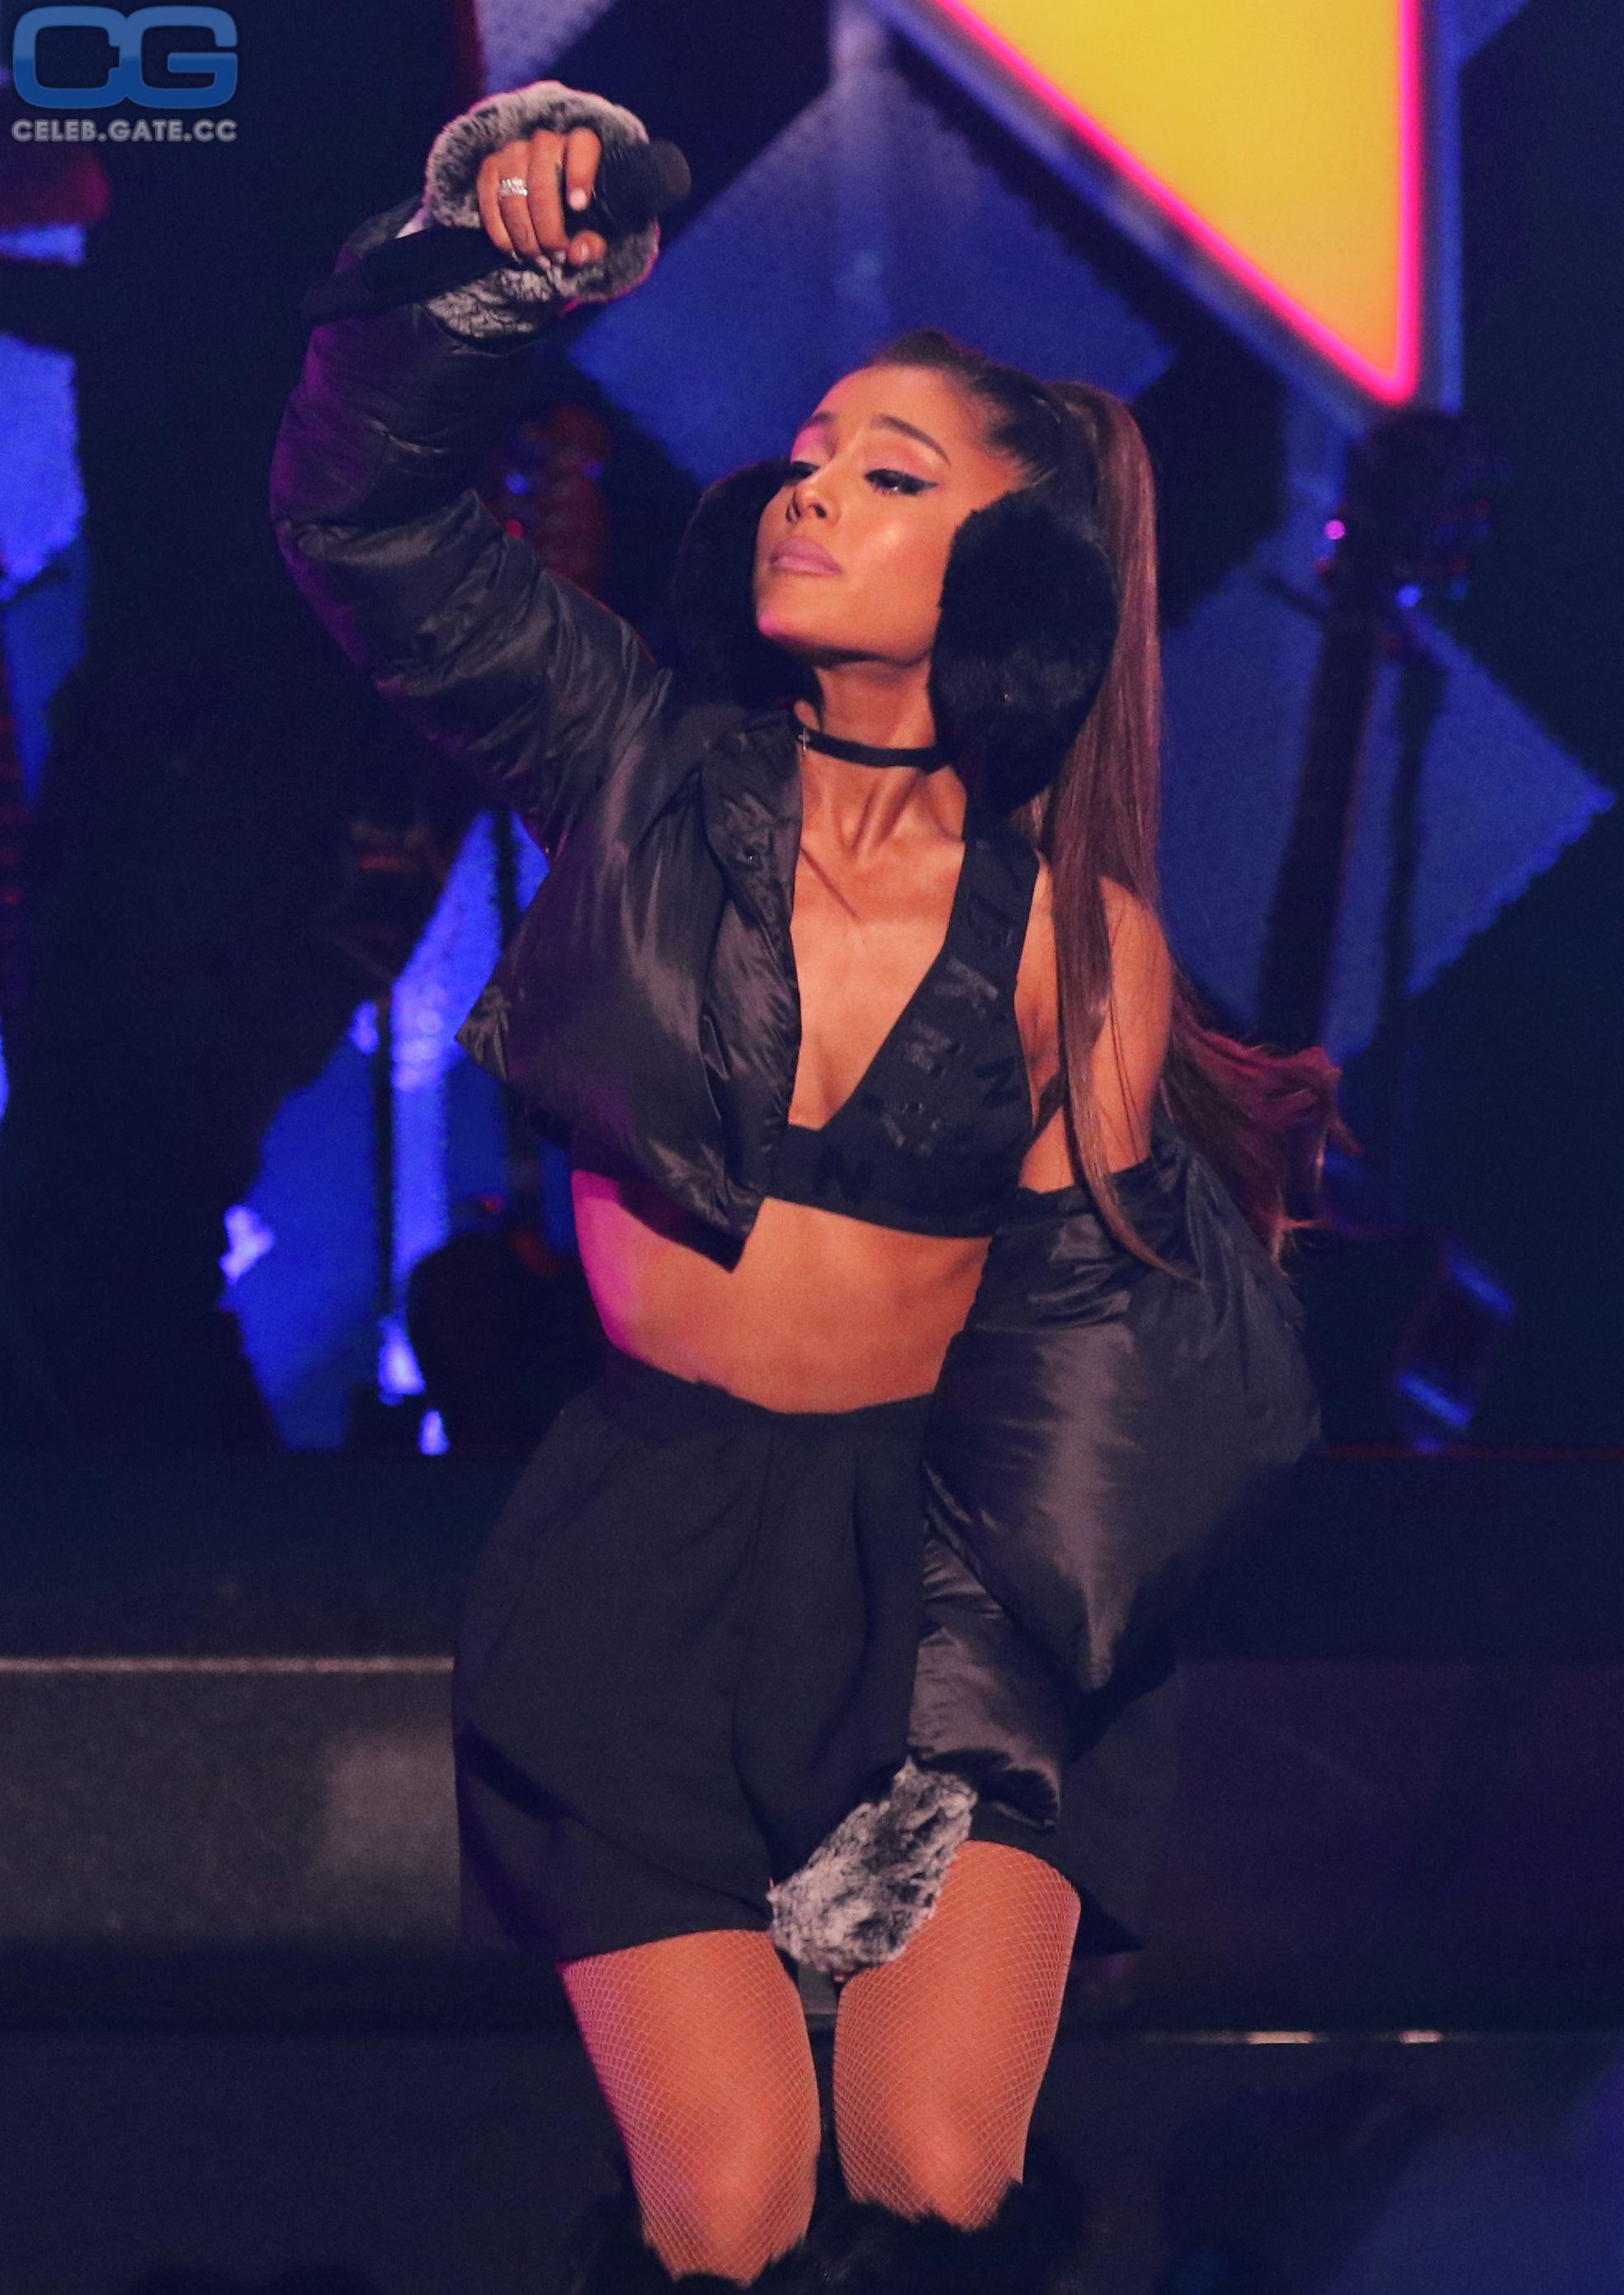 Nackt adriana grande Ariana Grande